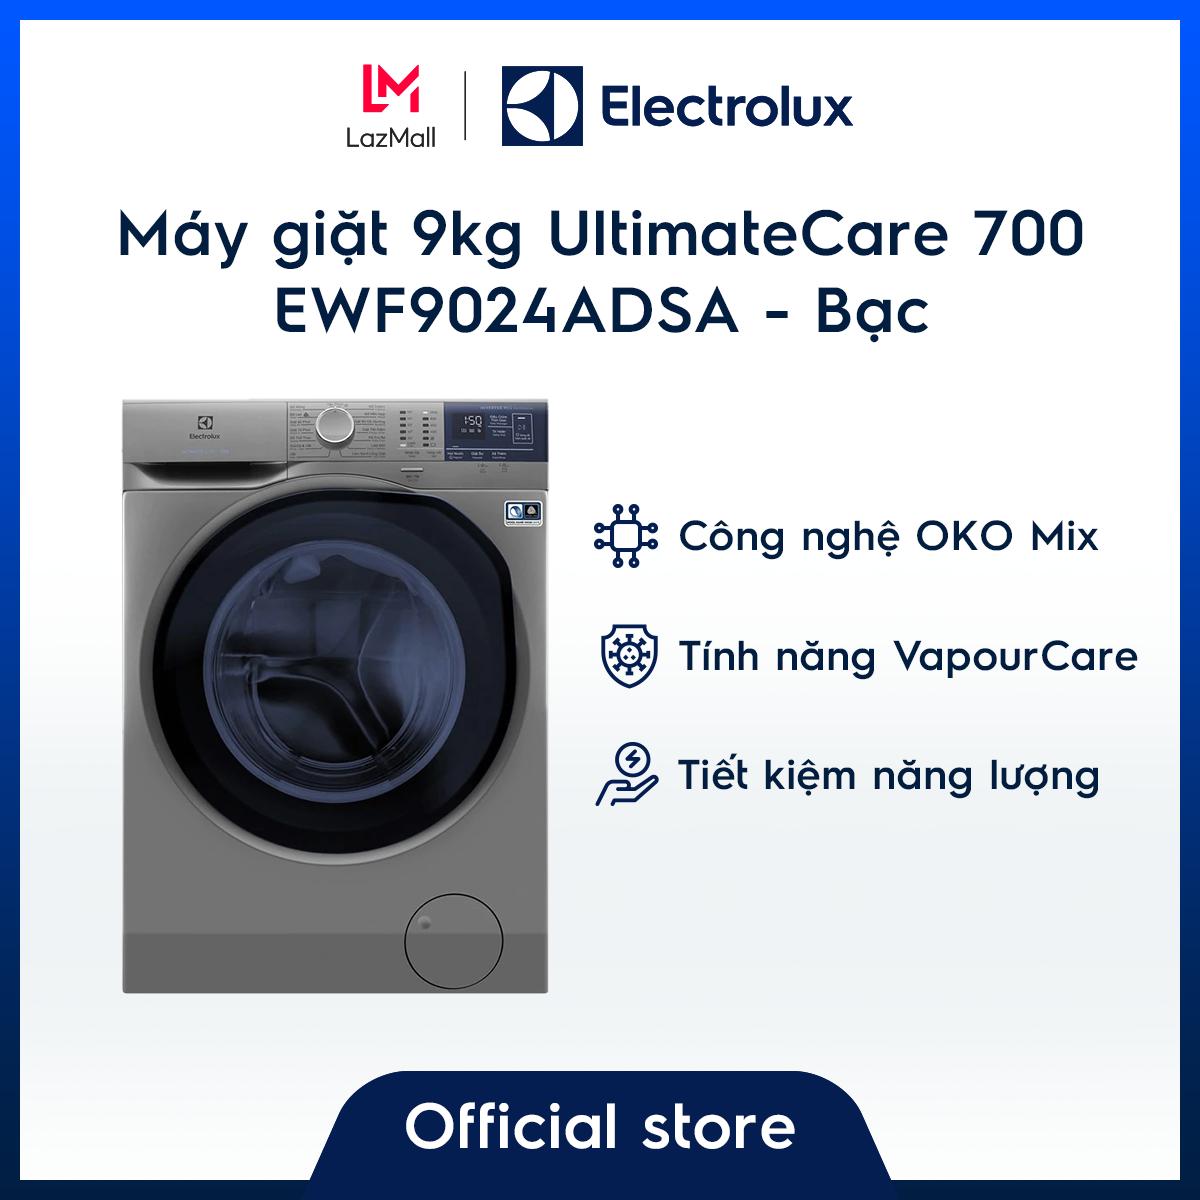 Máy giặt Electrolux 9kg UltimateCare 700 EWF9024ADSA (Bạc) – Công nghệ OKO Mix & Auto Sense